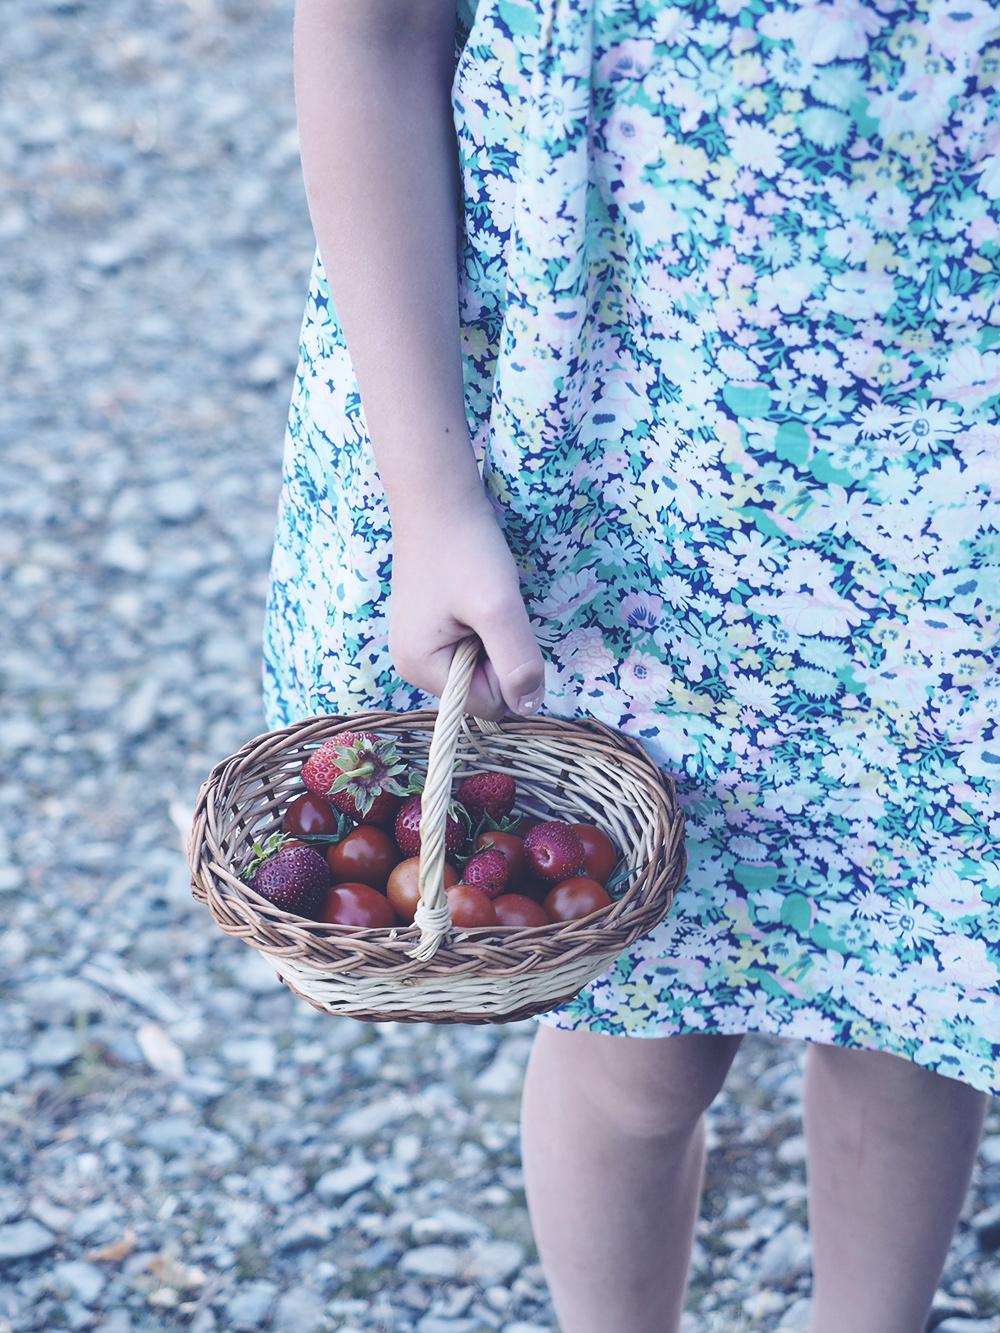 fillette-panier-fleurs